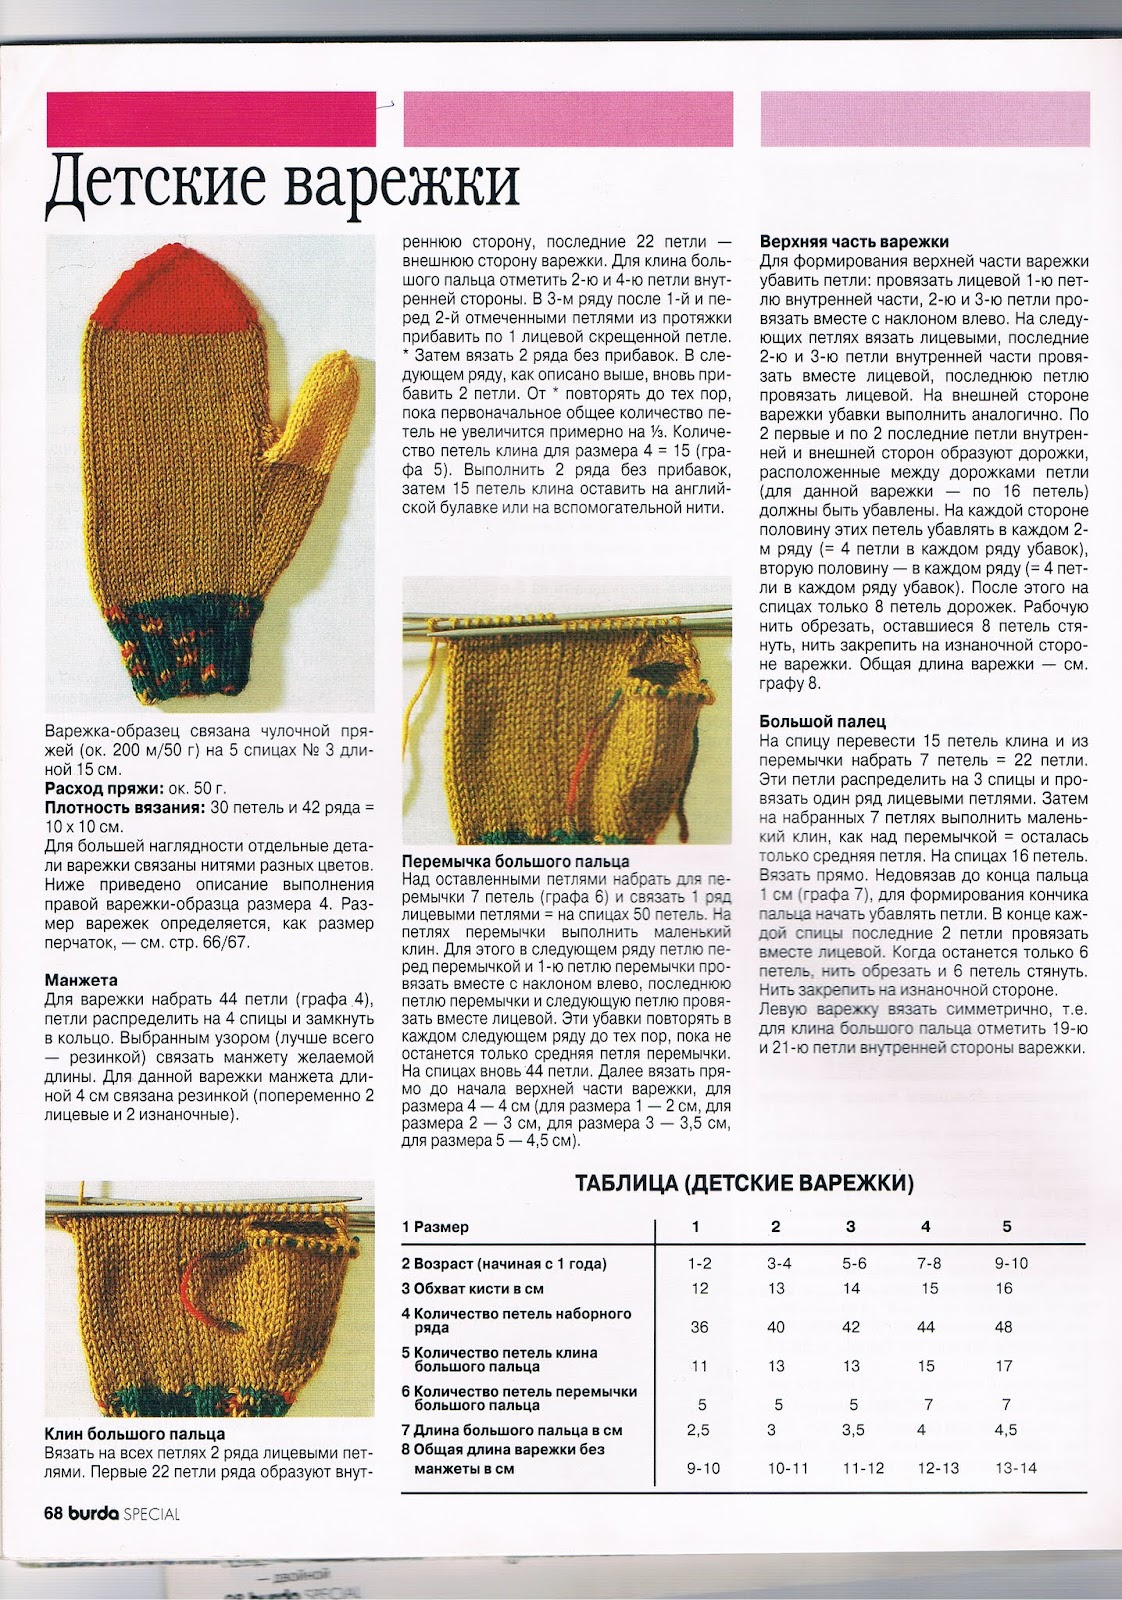 Вязание варежек на ребенка 1.5 года